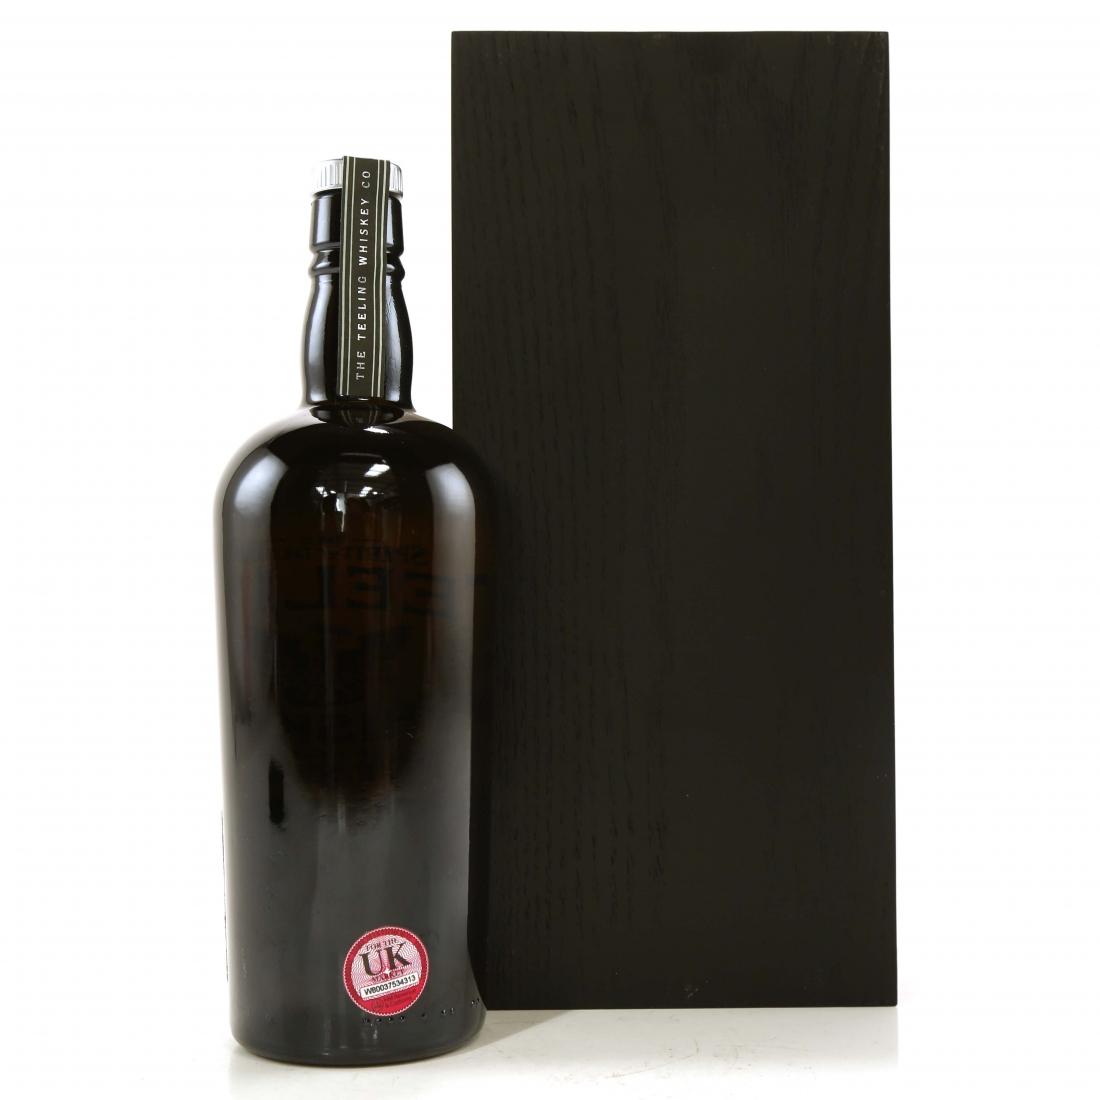 Teeling Celebratory Single Pot Still Whiskey / Bottle #039